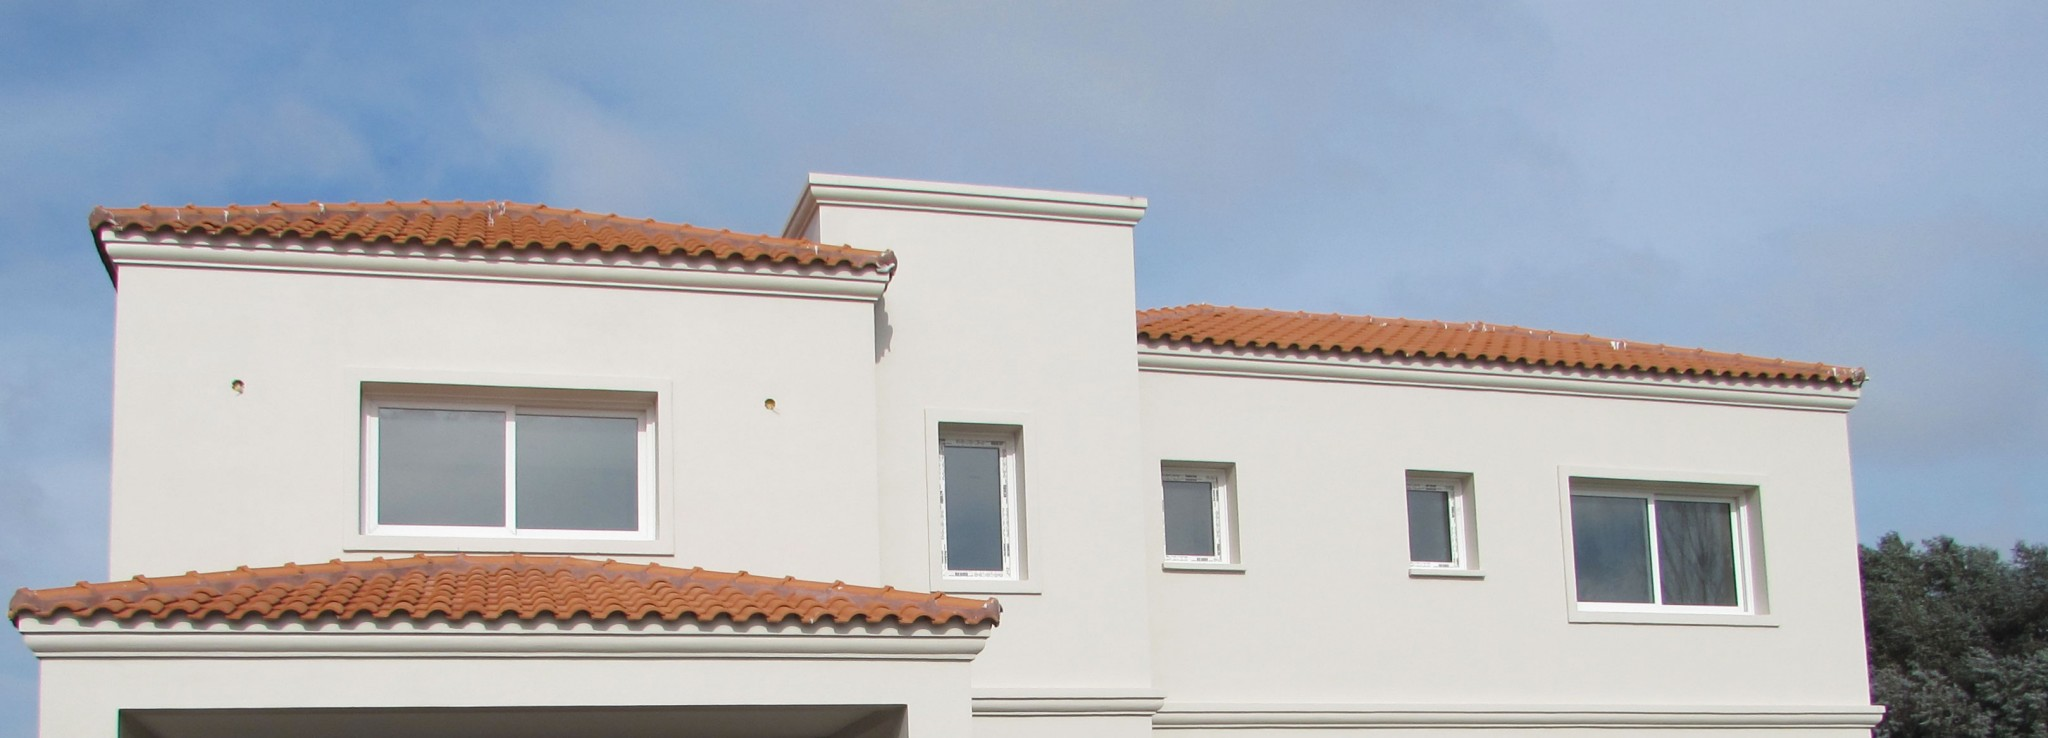 agra-salgado-arquitectura-arquitecto-mar-del-plata-1